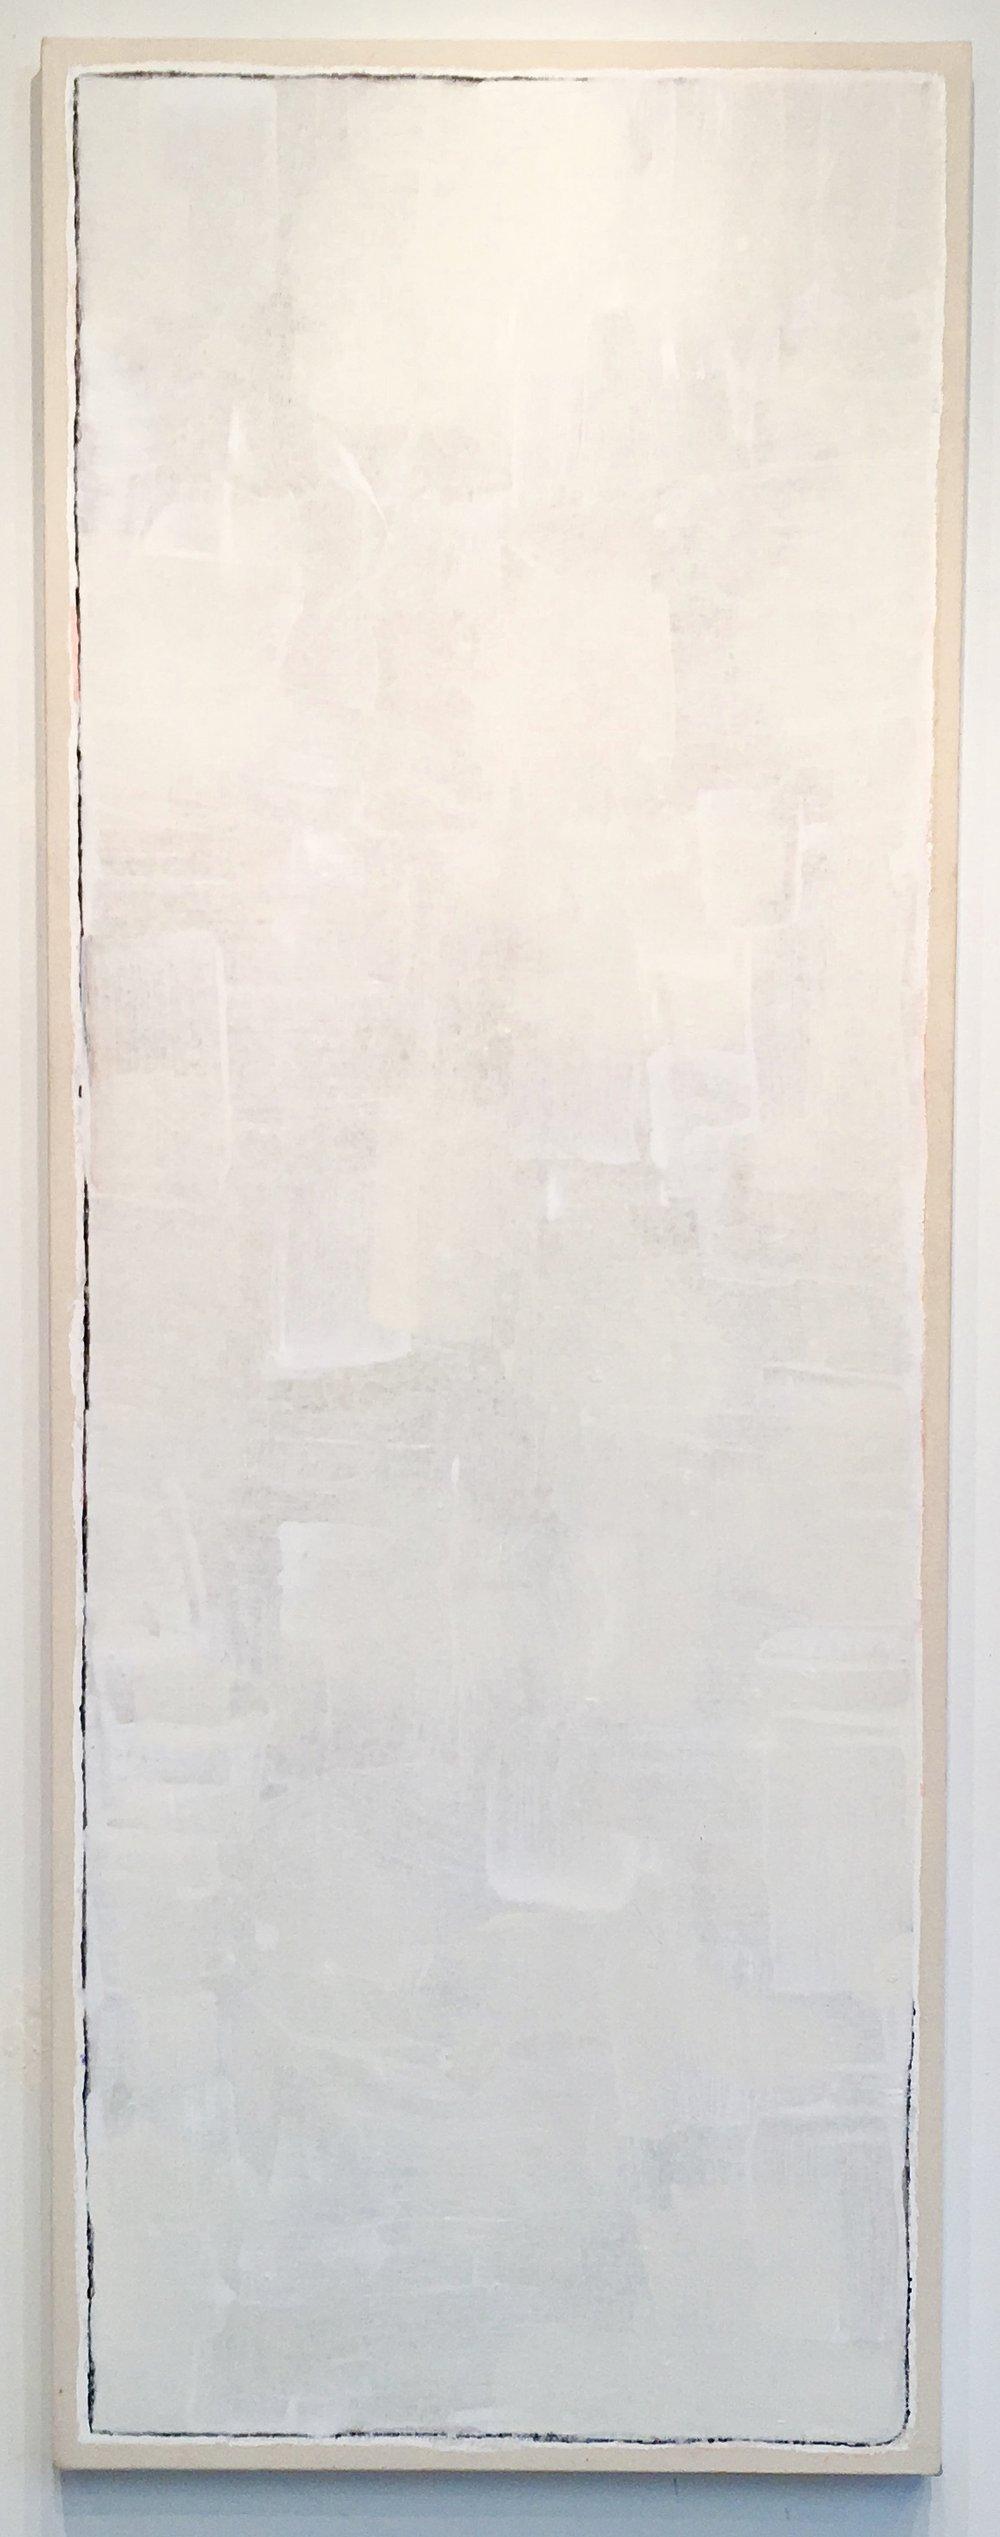 Allah, 80 x 30 inches, 2018